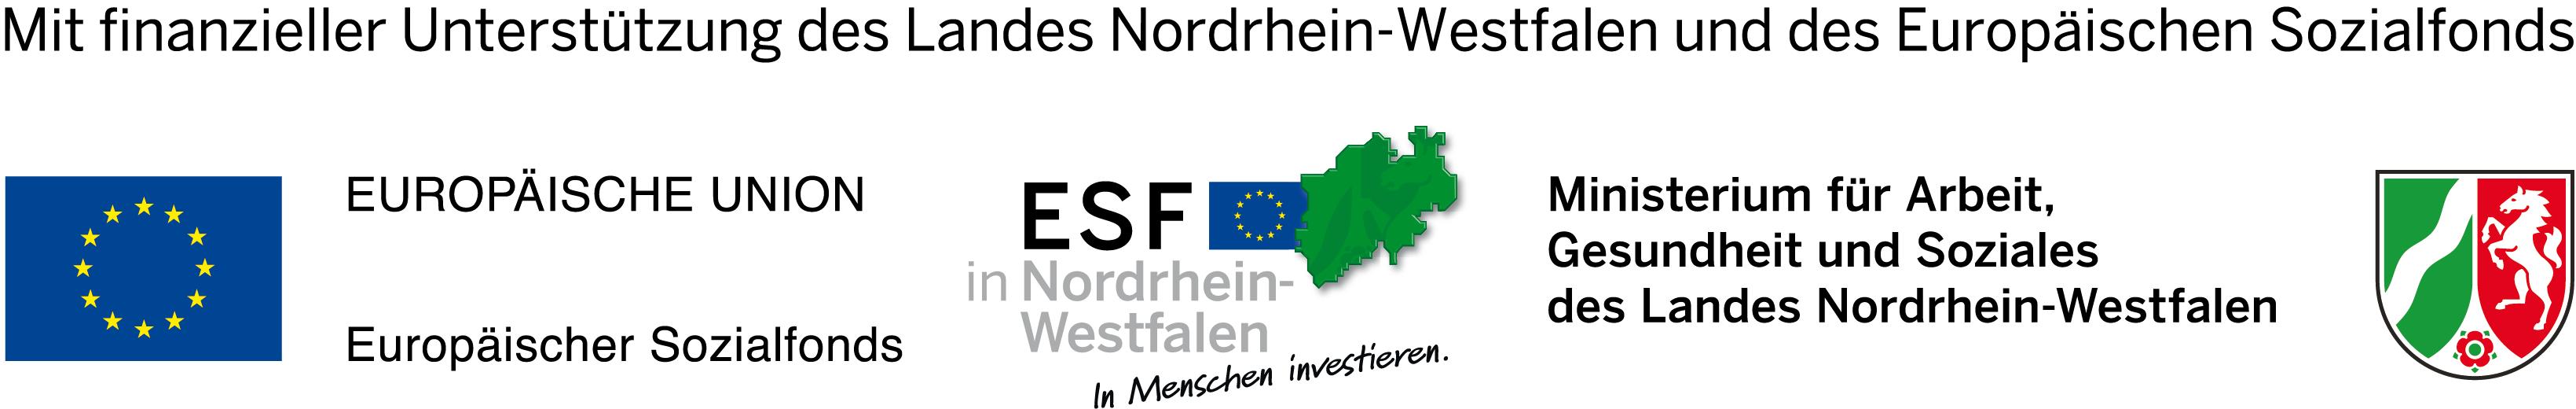 Logokombination des EU-, ESF in NRW und MAGS-Logos, nebeneinander, farbig, mit Förderhinweis